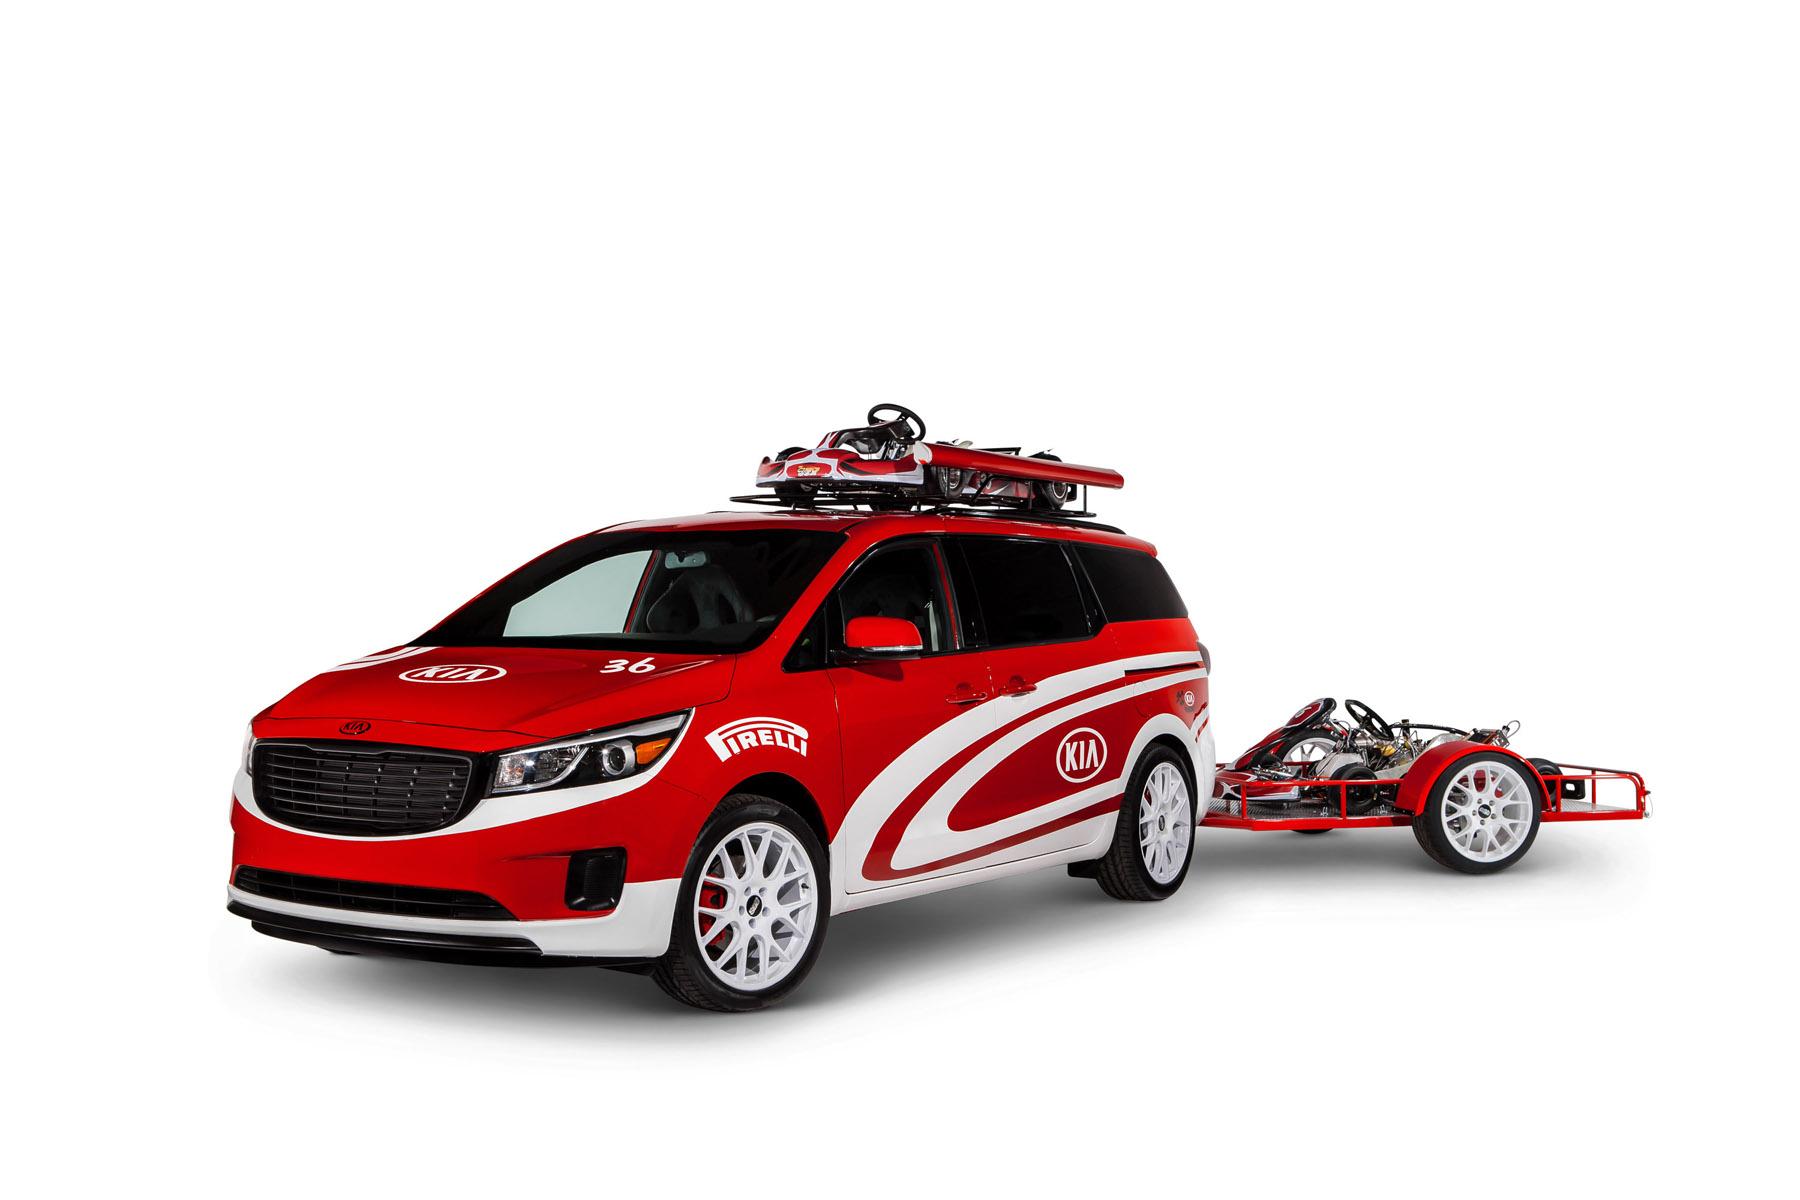 2015 Ultimate Karting Kia Sedona